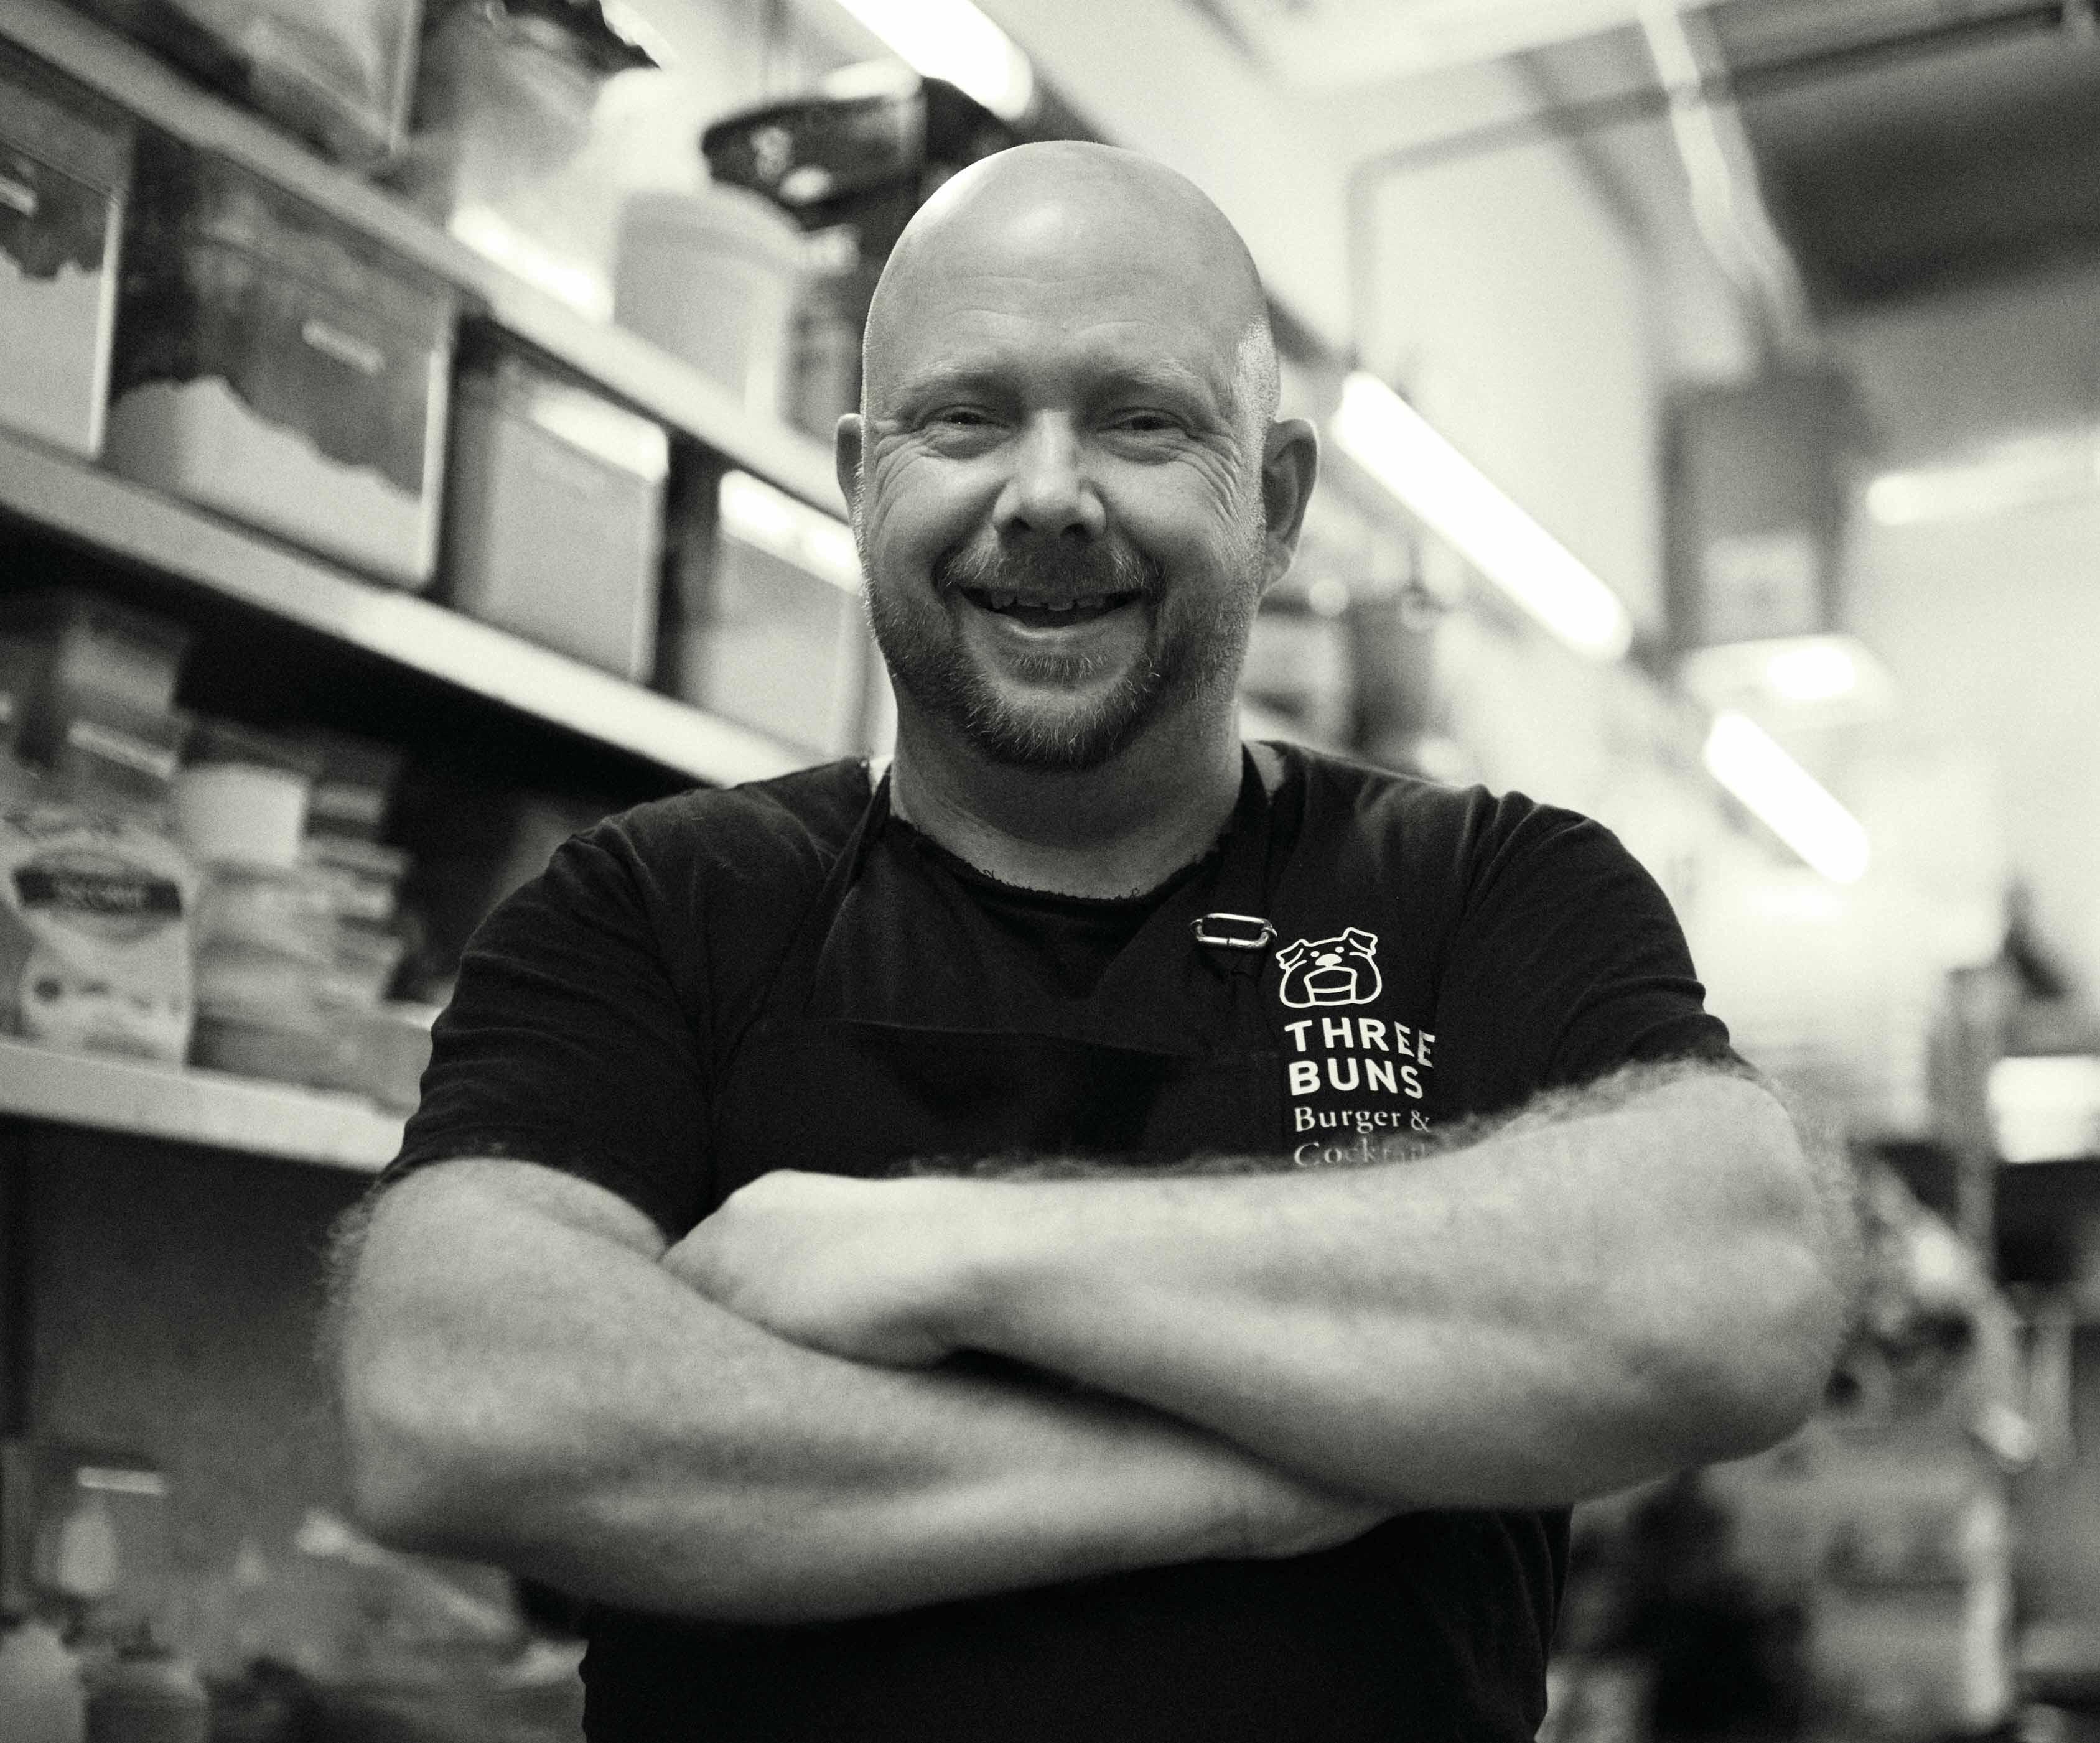 Adam Penney, head chef at Potato Head Folk and Three Buns